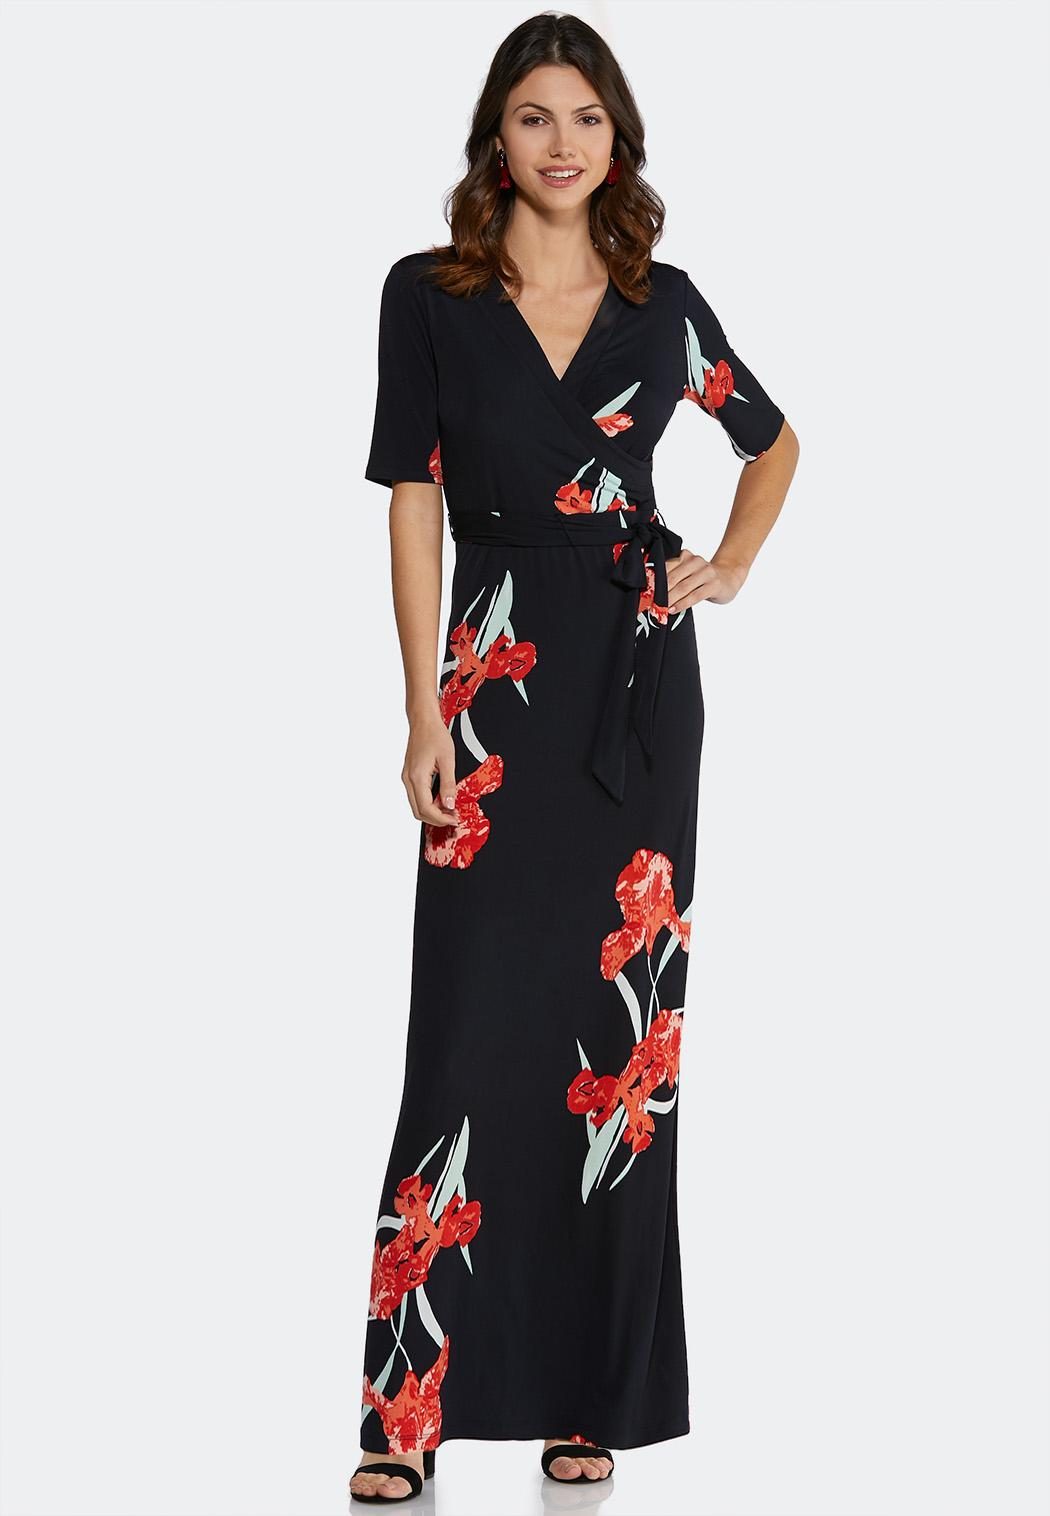 Plus Size Dresses For Women Swing Maxi Midi More